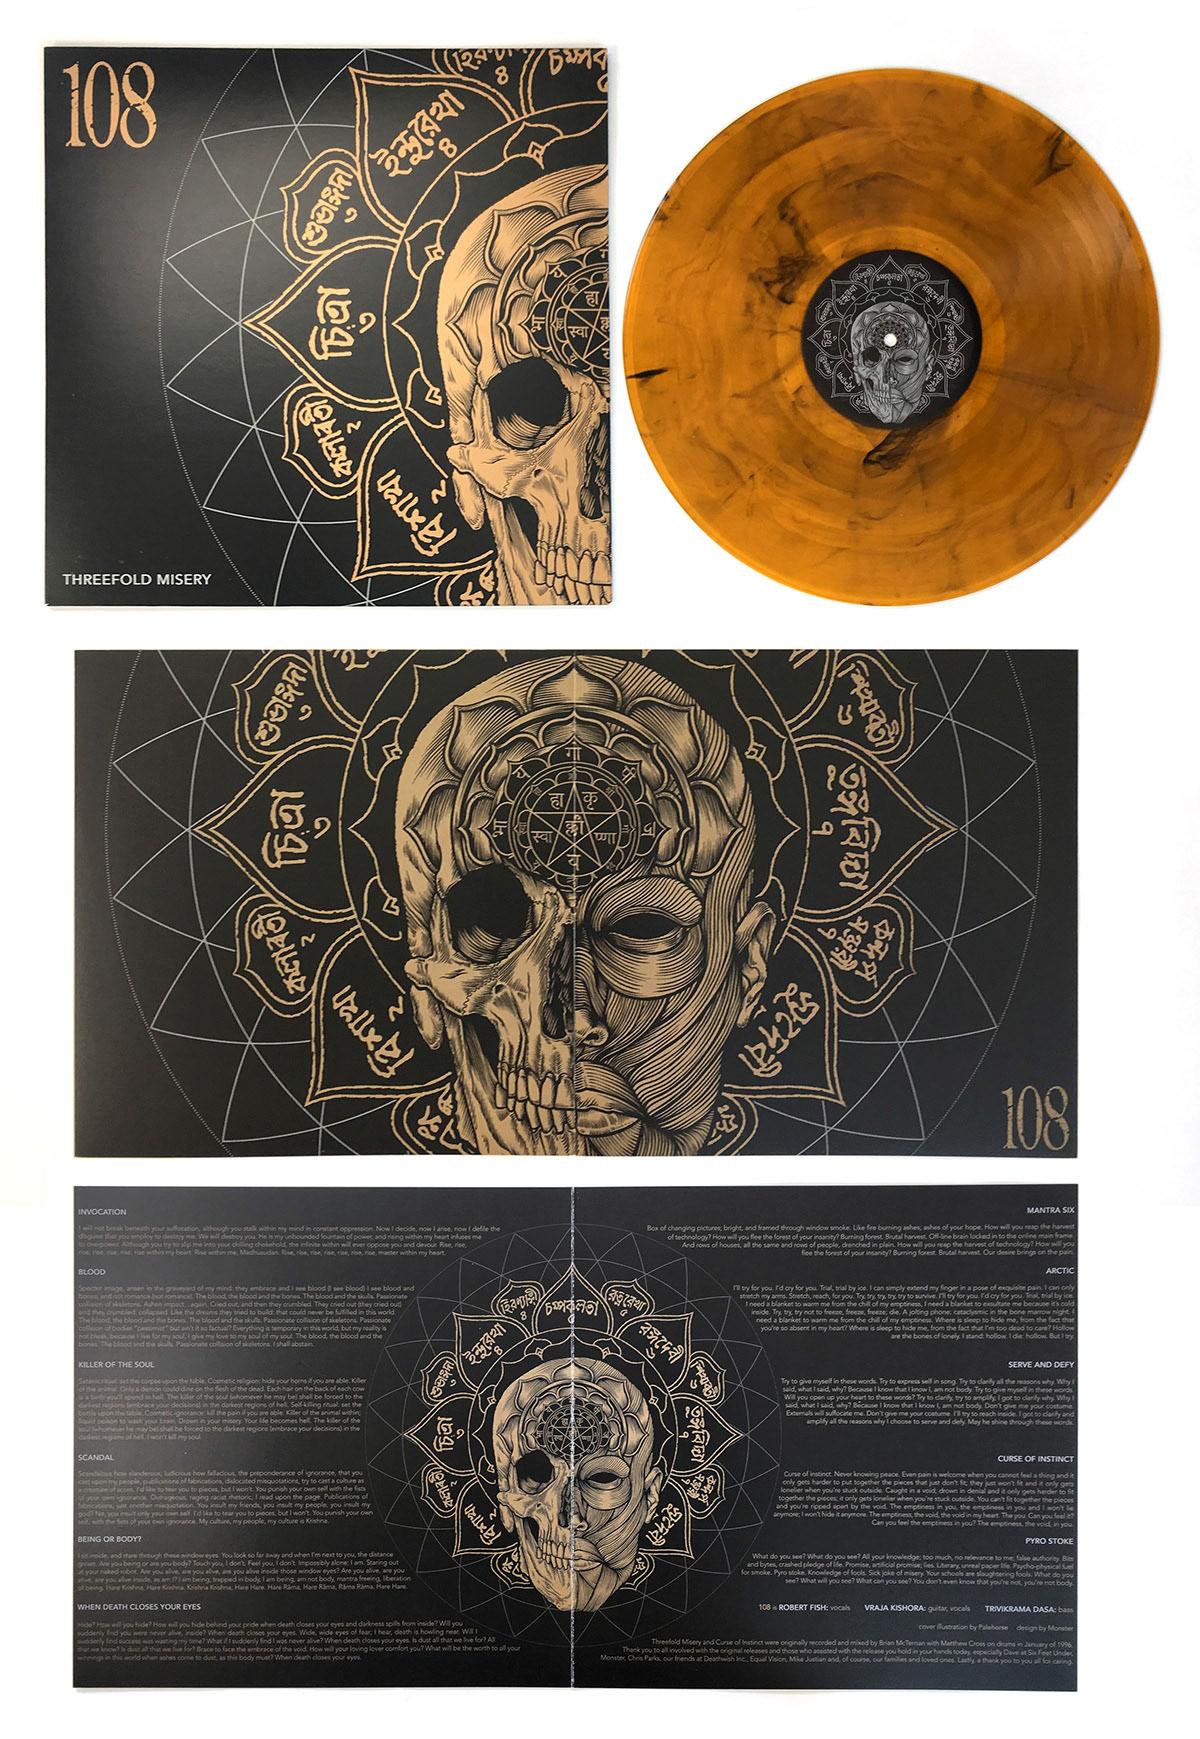 Official Palehorse Portfolio - 108: Threefold Misery Album